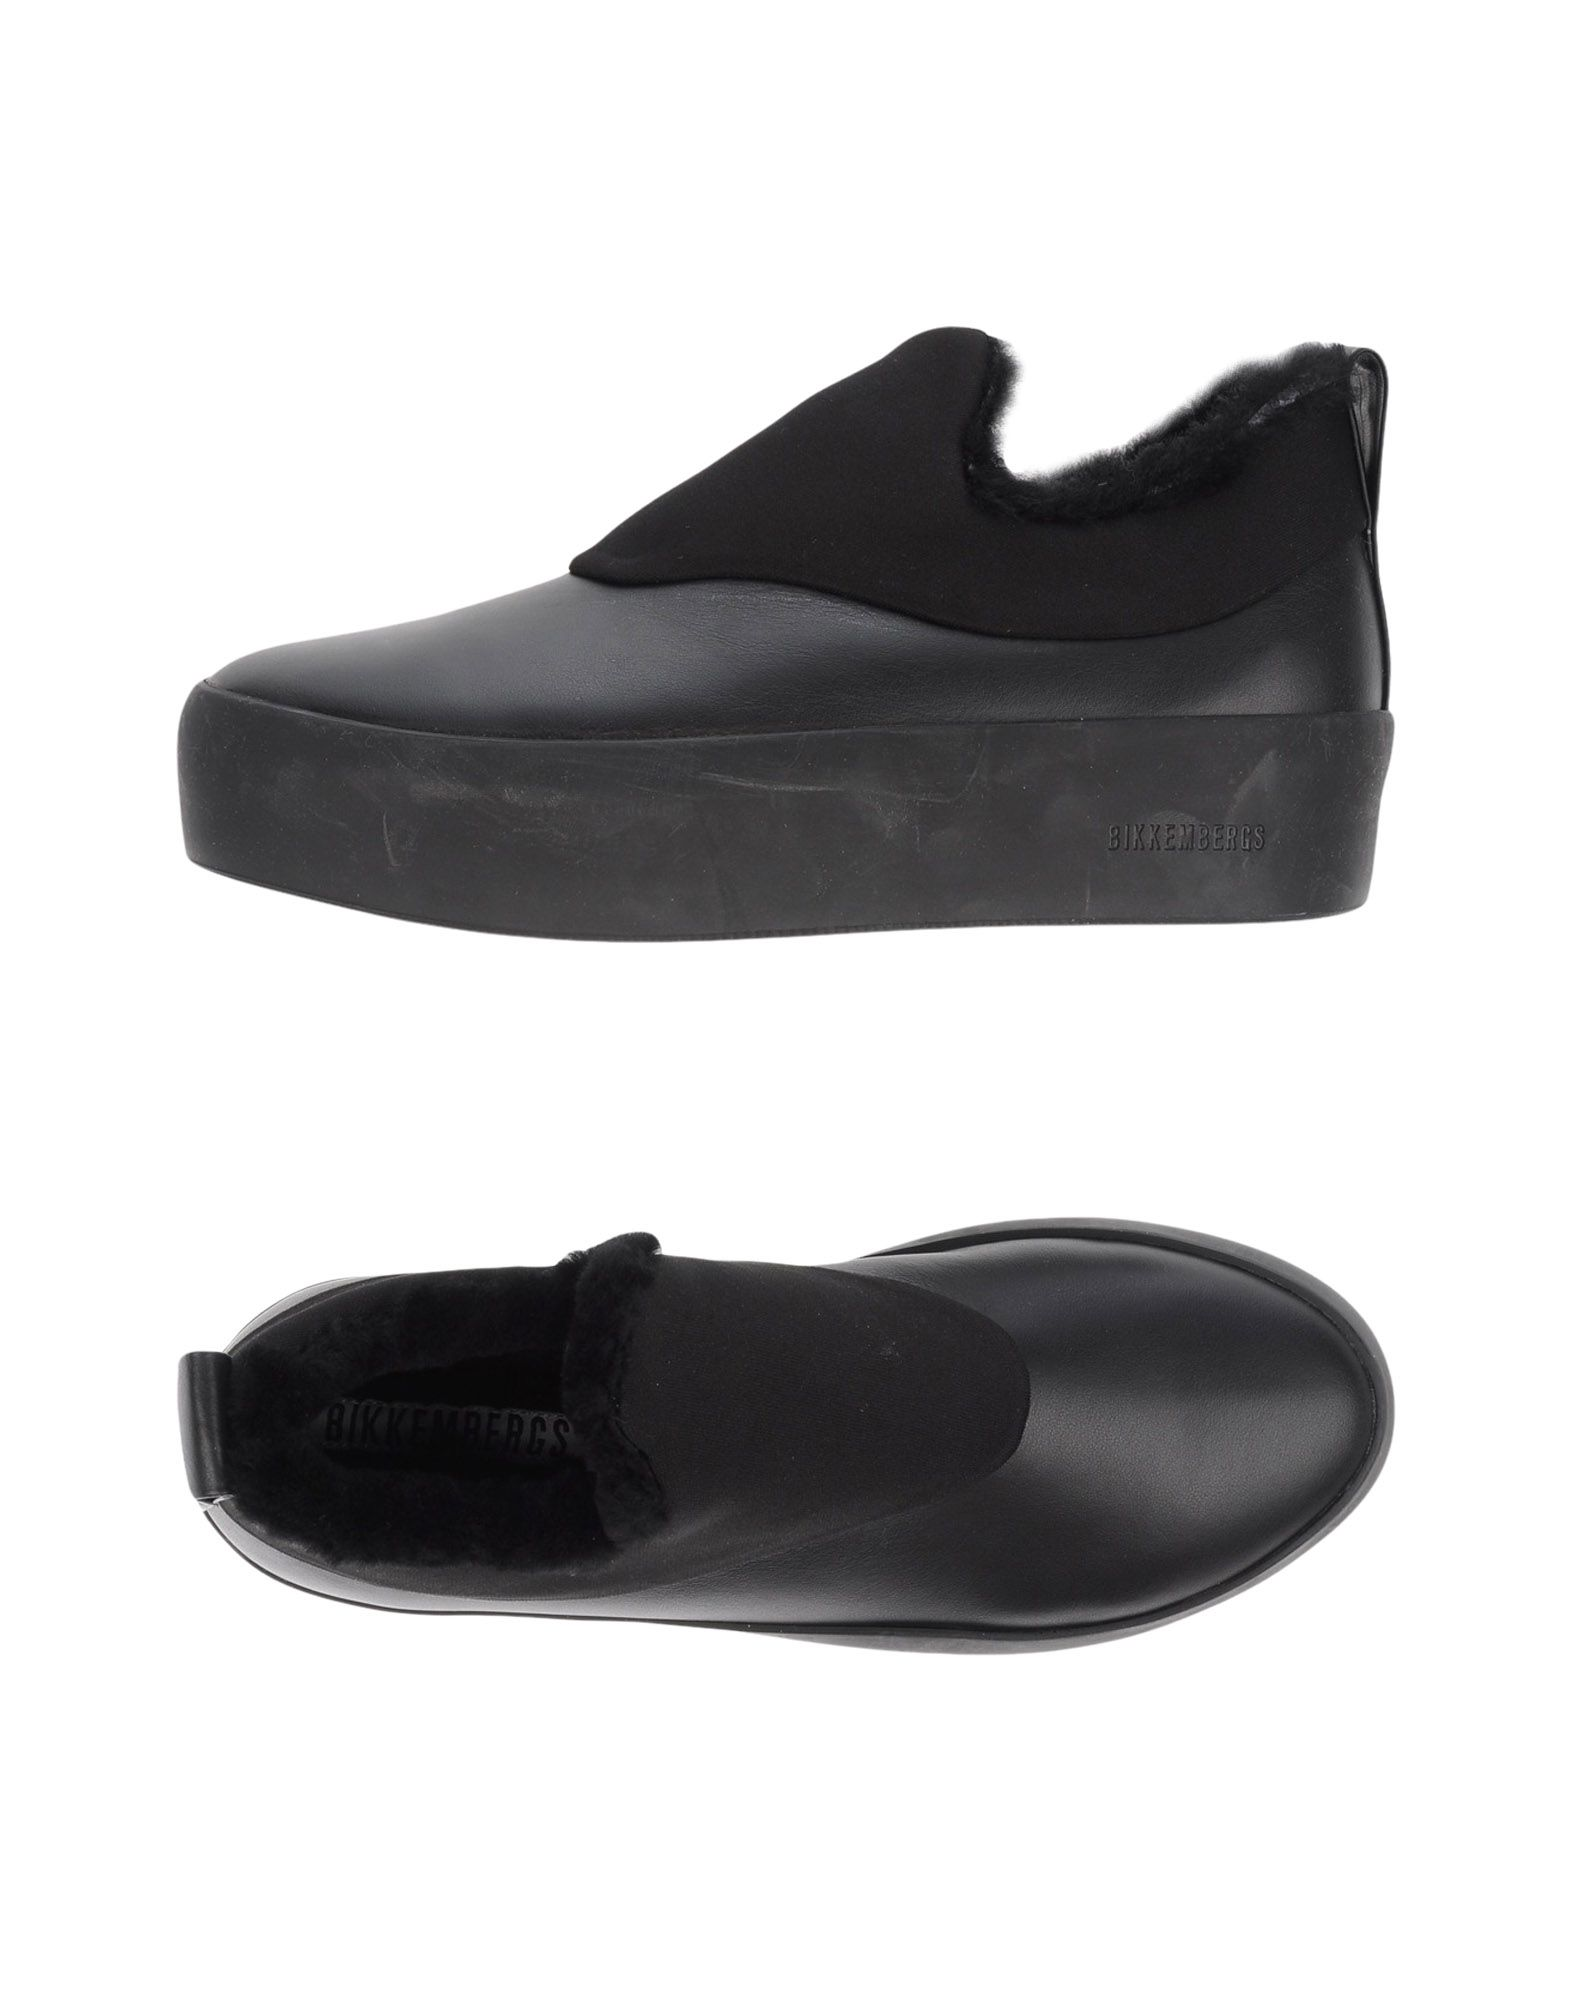 Bikkembergs Sneakers - Women Bikkembergs Sneakers online on 11219719DS  United Kingdom - 11219719DS on 2c963e